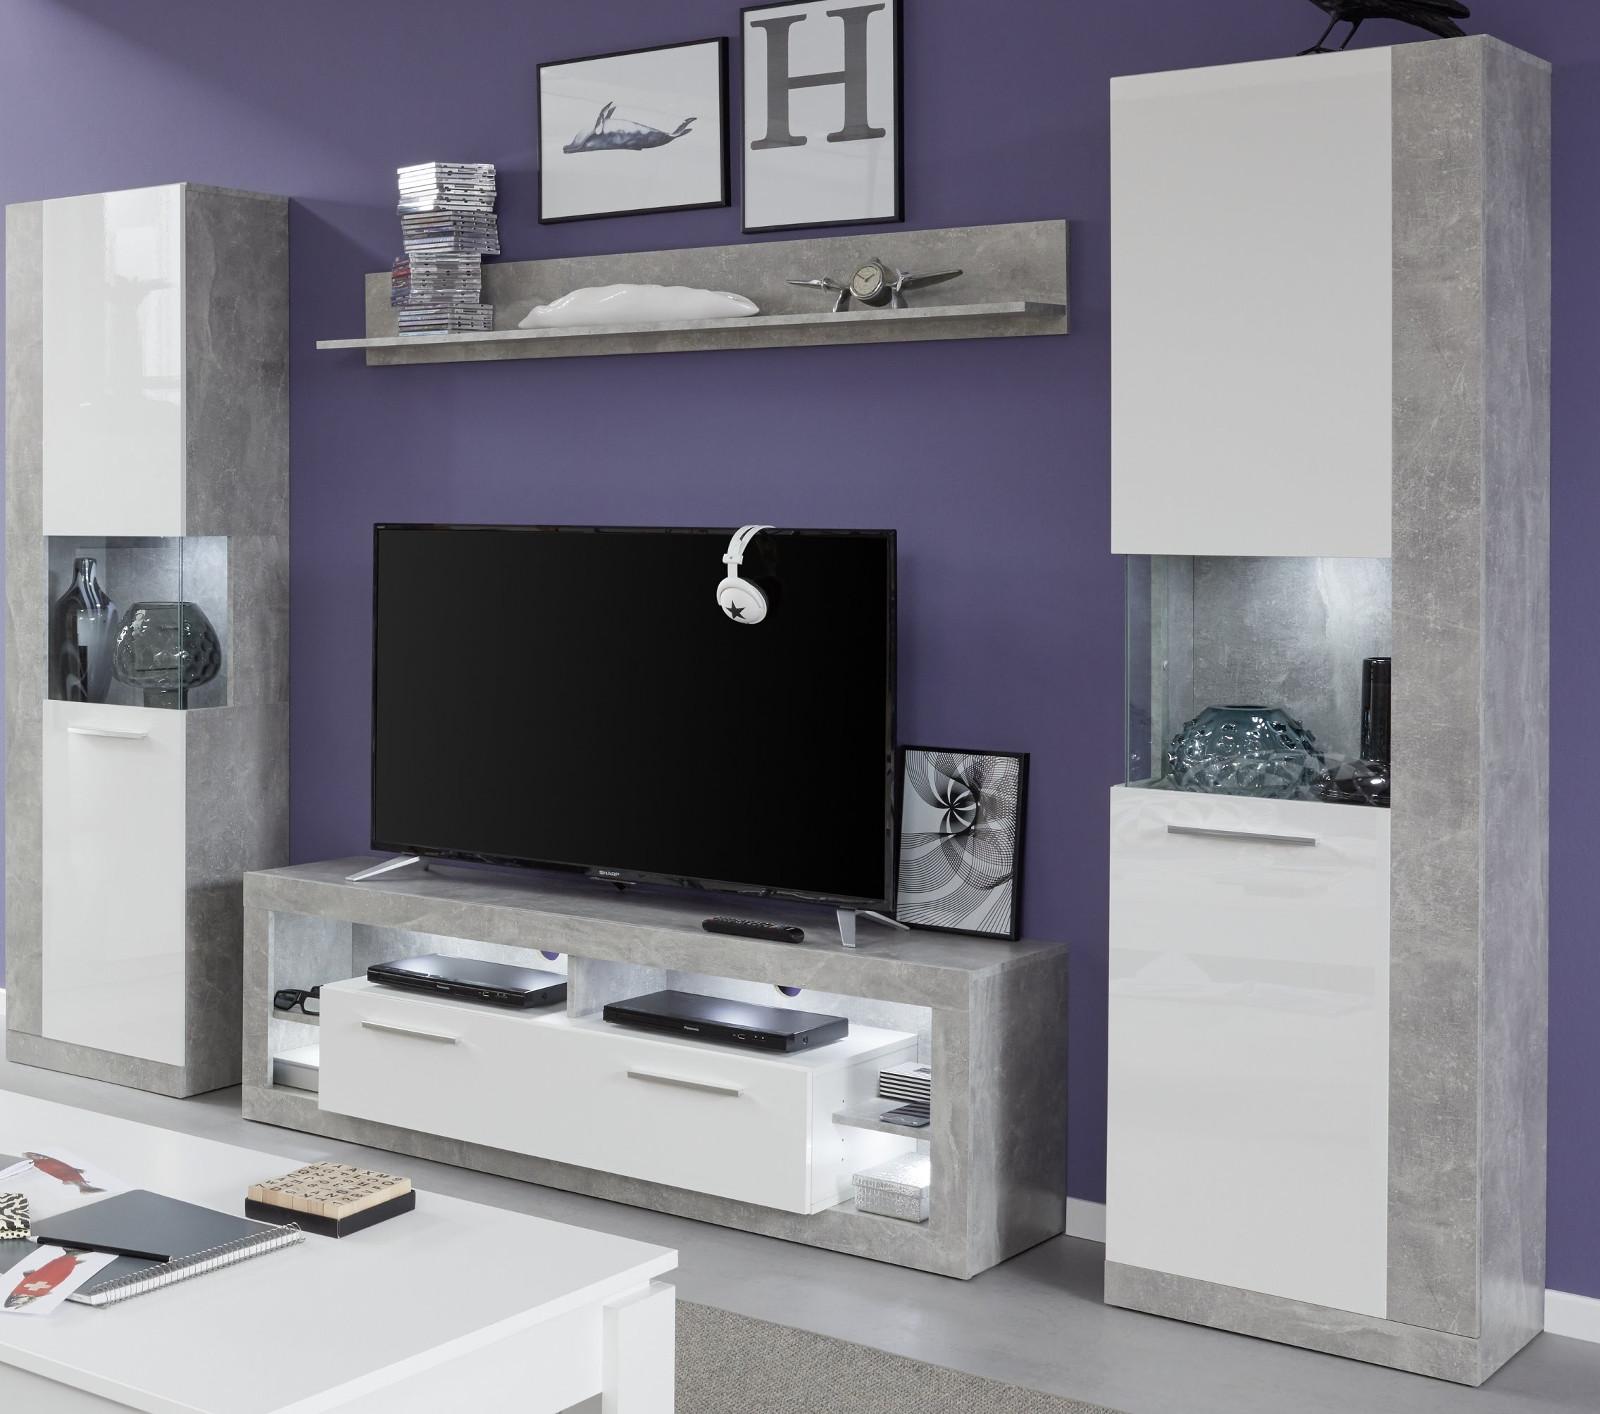 Wohnwand Rock Weiß Hochglanz Und Stone Grau 290x186 Cm